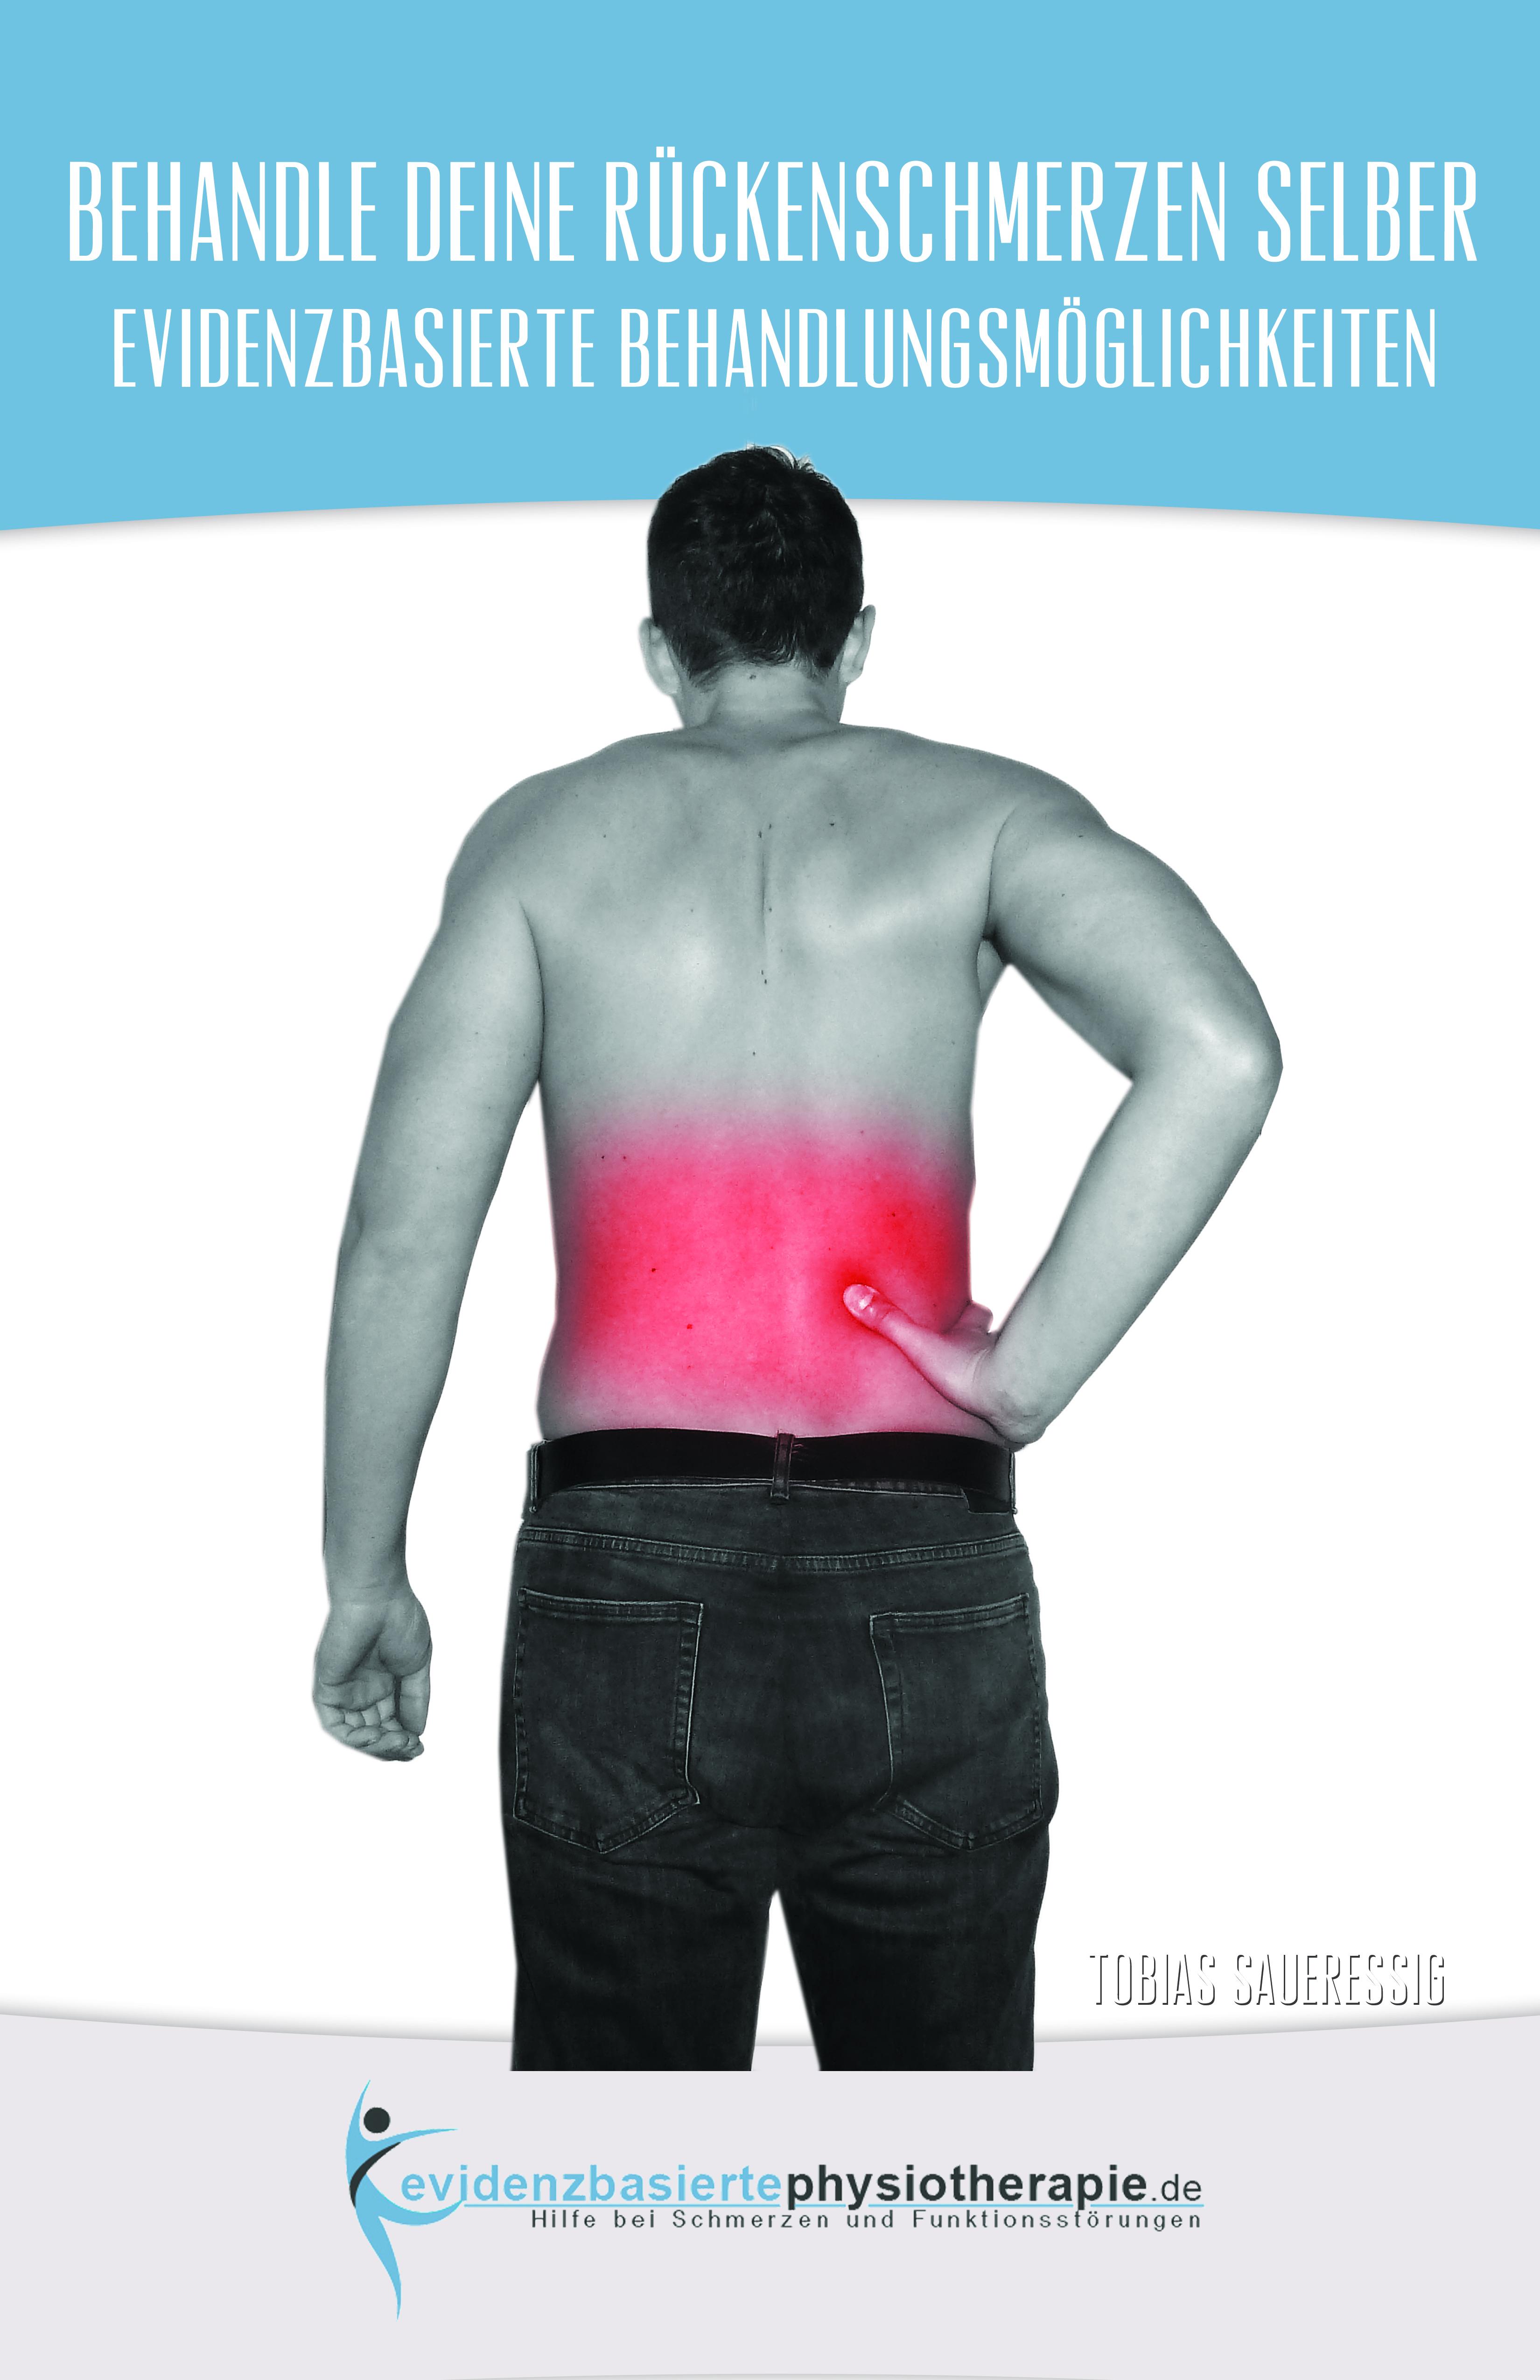 Buch chronische Rückenschmerzen